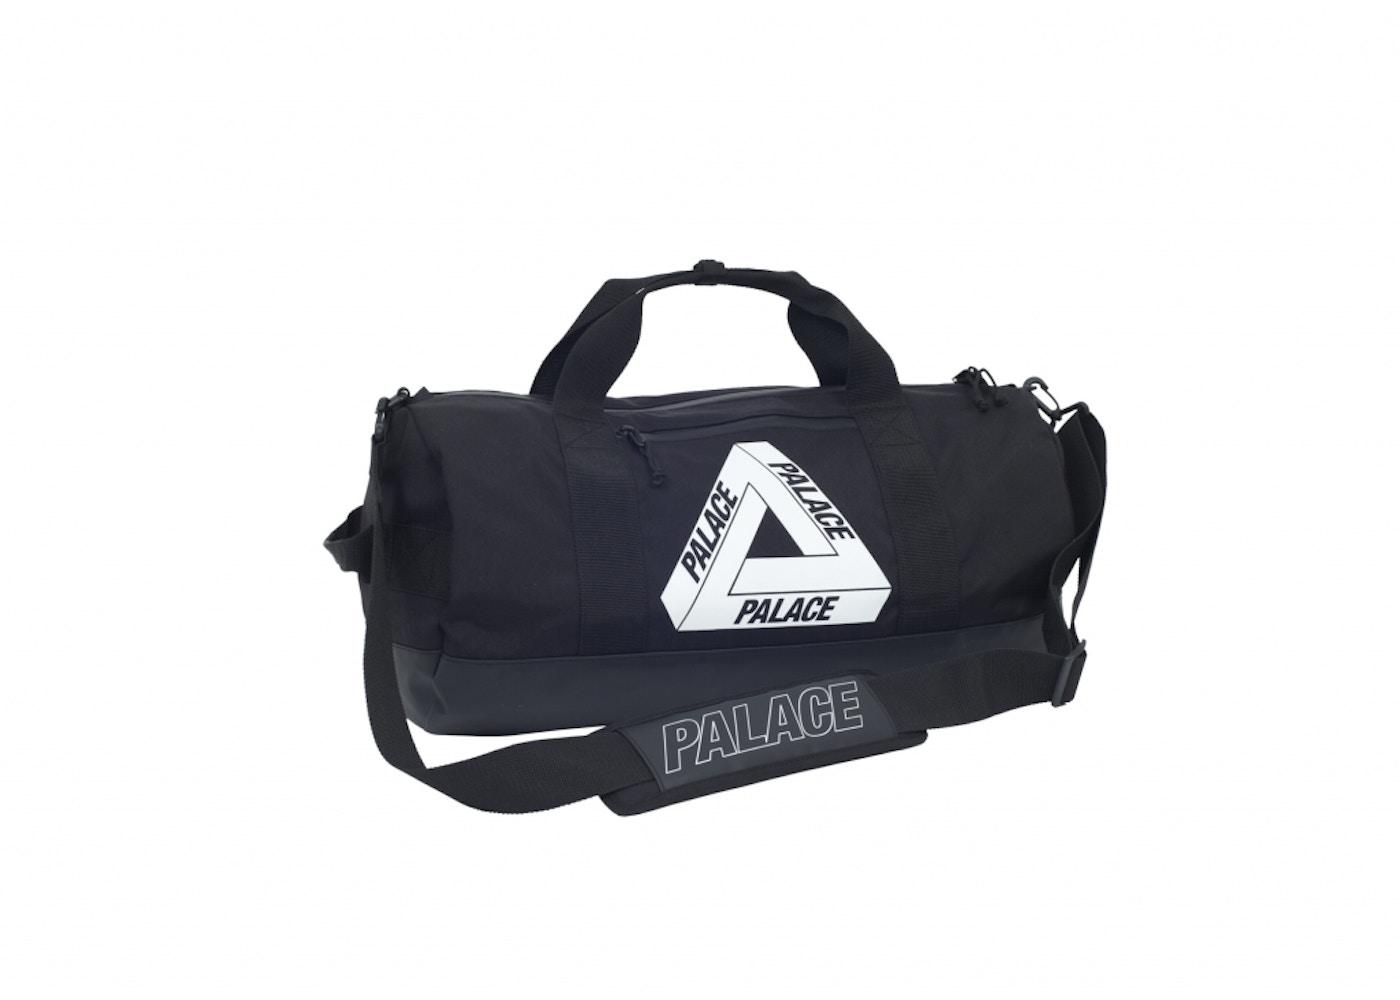 9794e2eb Streetwear - Palace Accessories - Average Sale Price